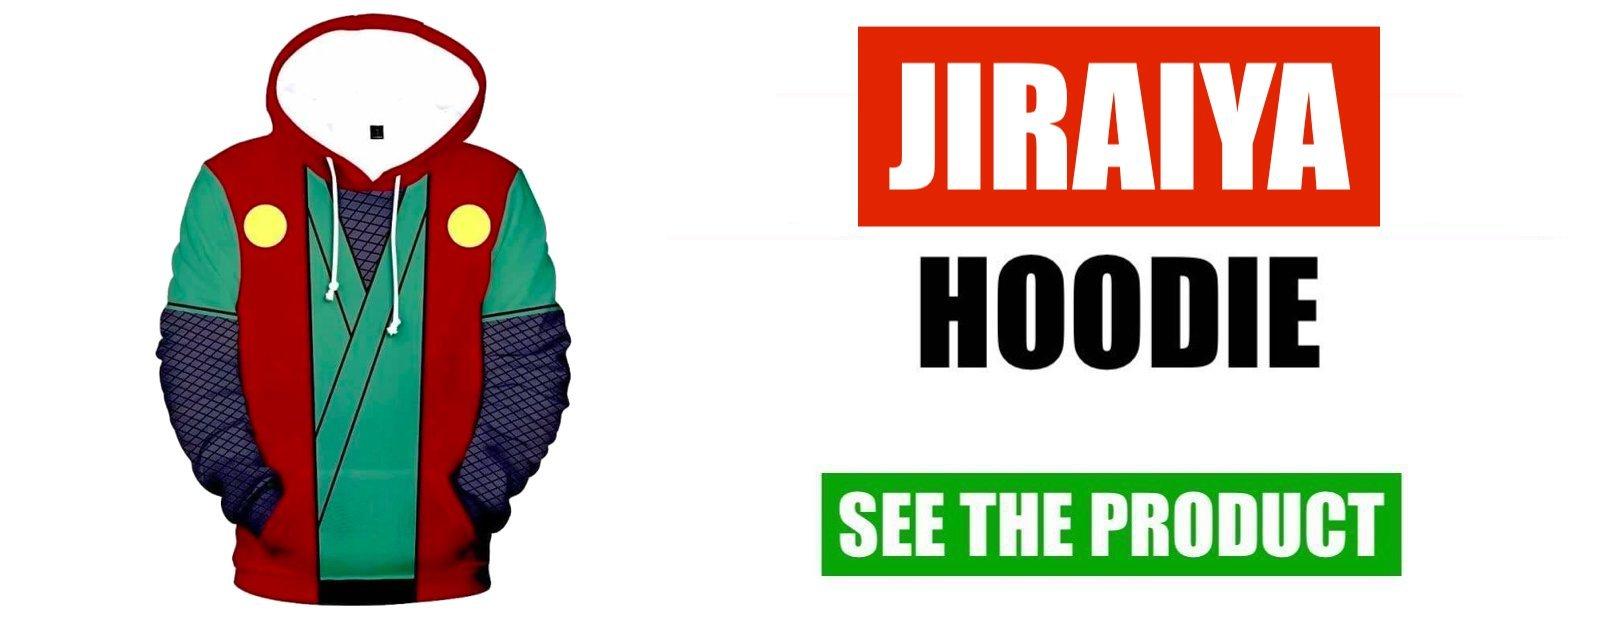 jiraiya hoodie